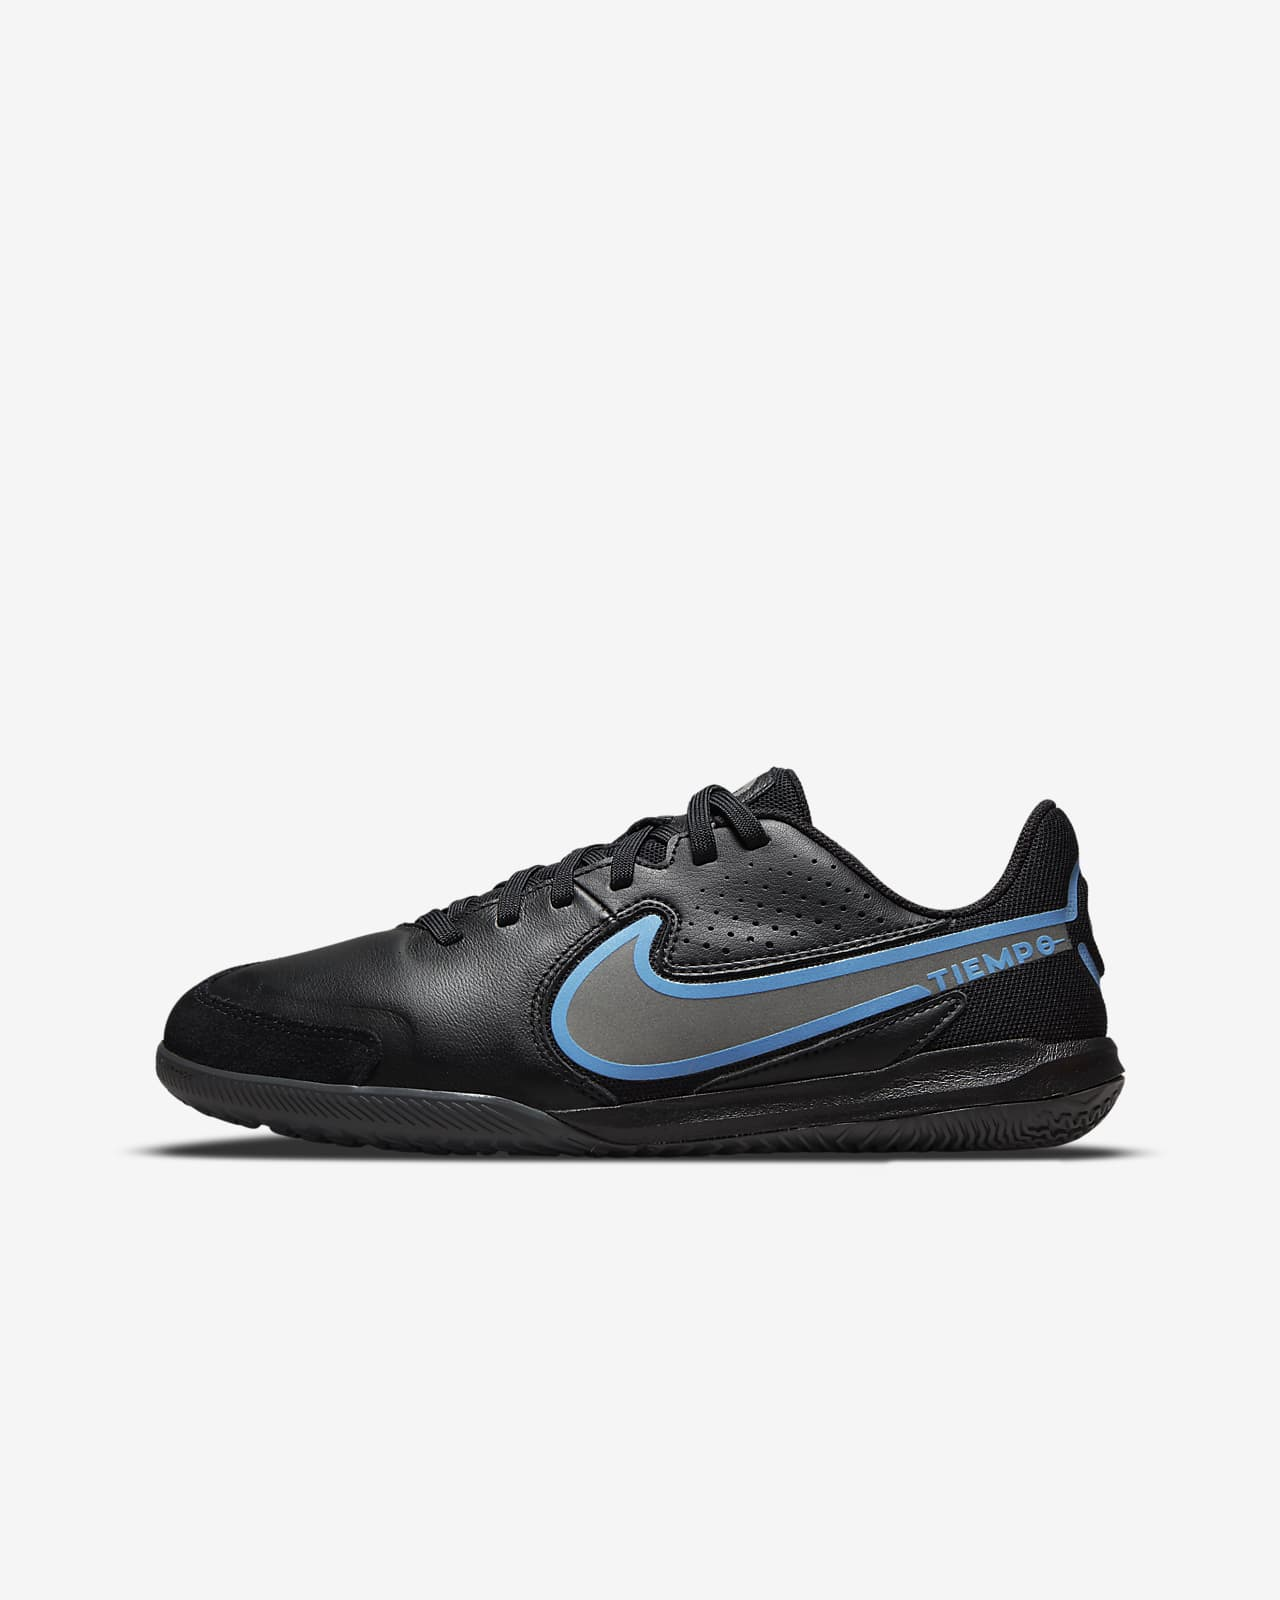 Nike Jr. Tiempo Legend 9 Academy IC 小/大童體育館/路面足球鞋